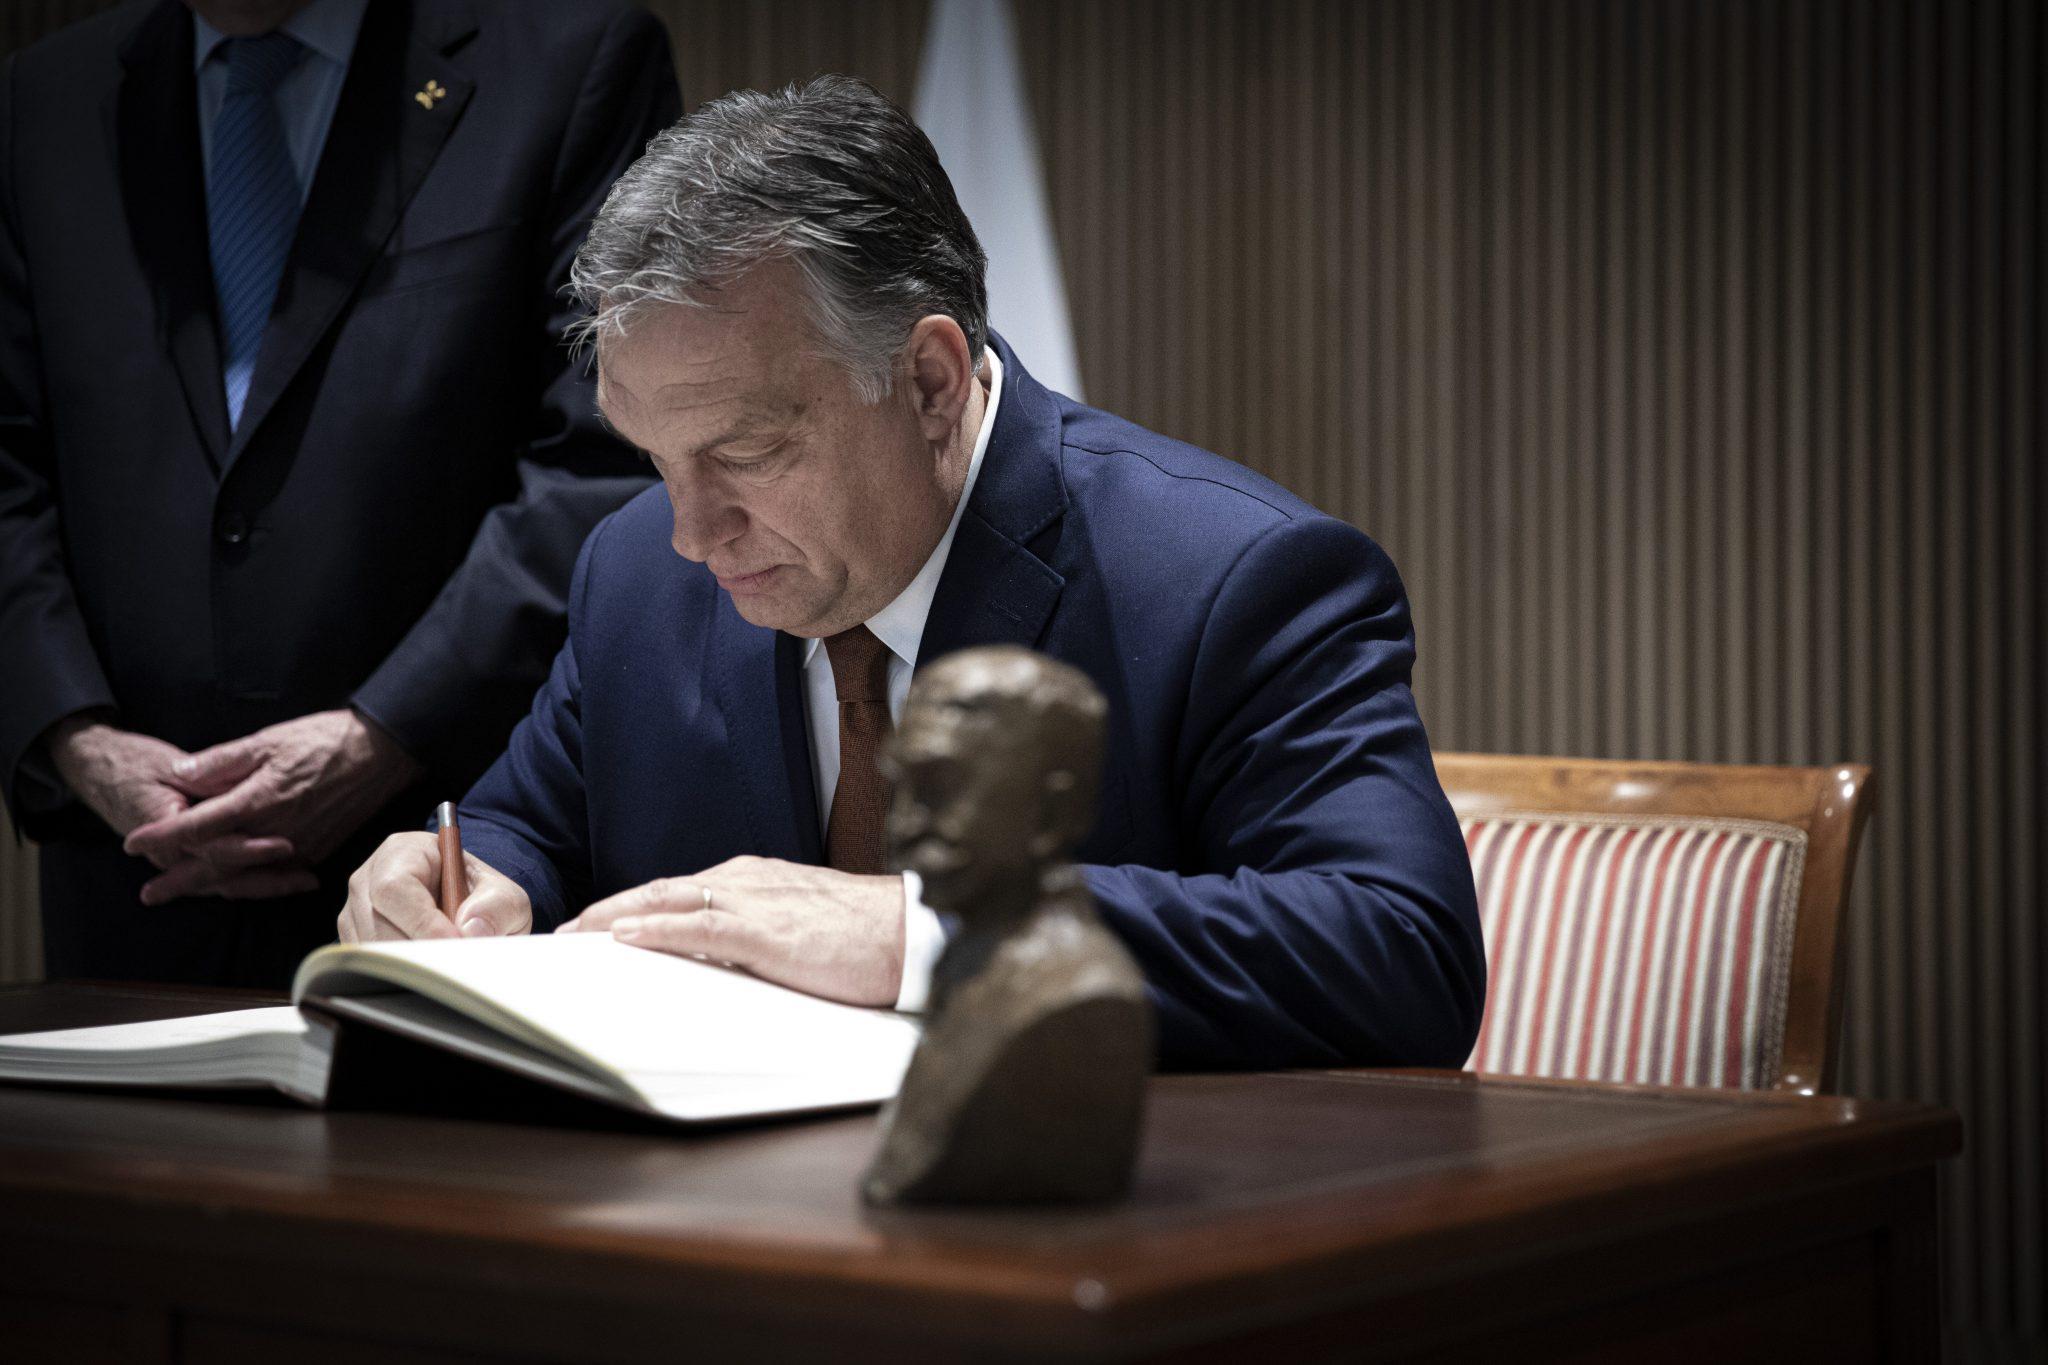 Orbán über János Horváth: Tapferer Patriot und kompromissloser Politiker post's picture